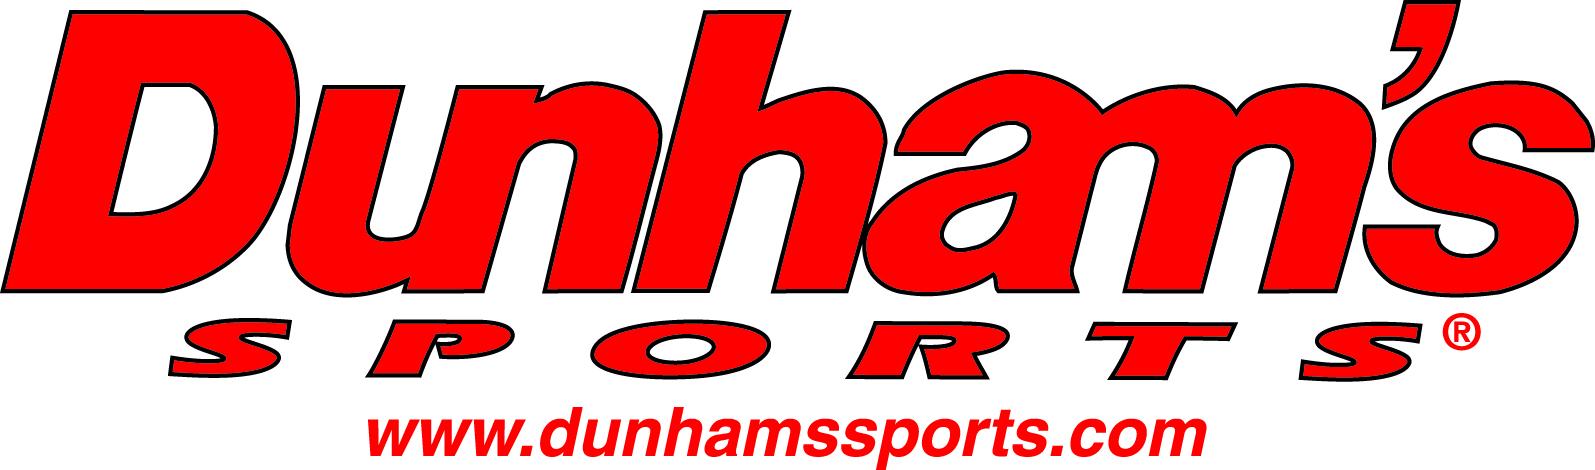 Dunham%27s Sports URL red.jpg